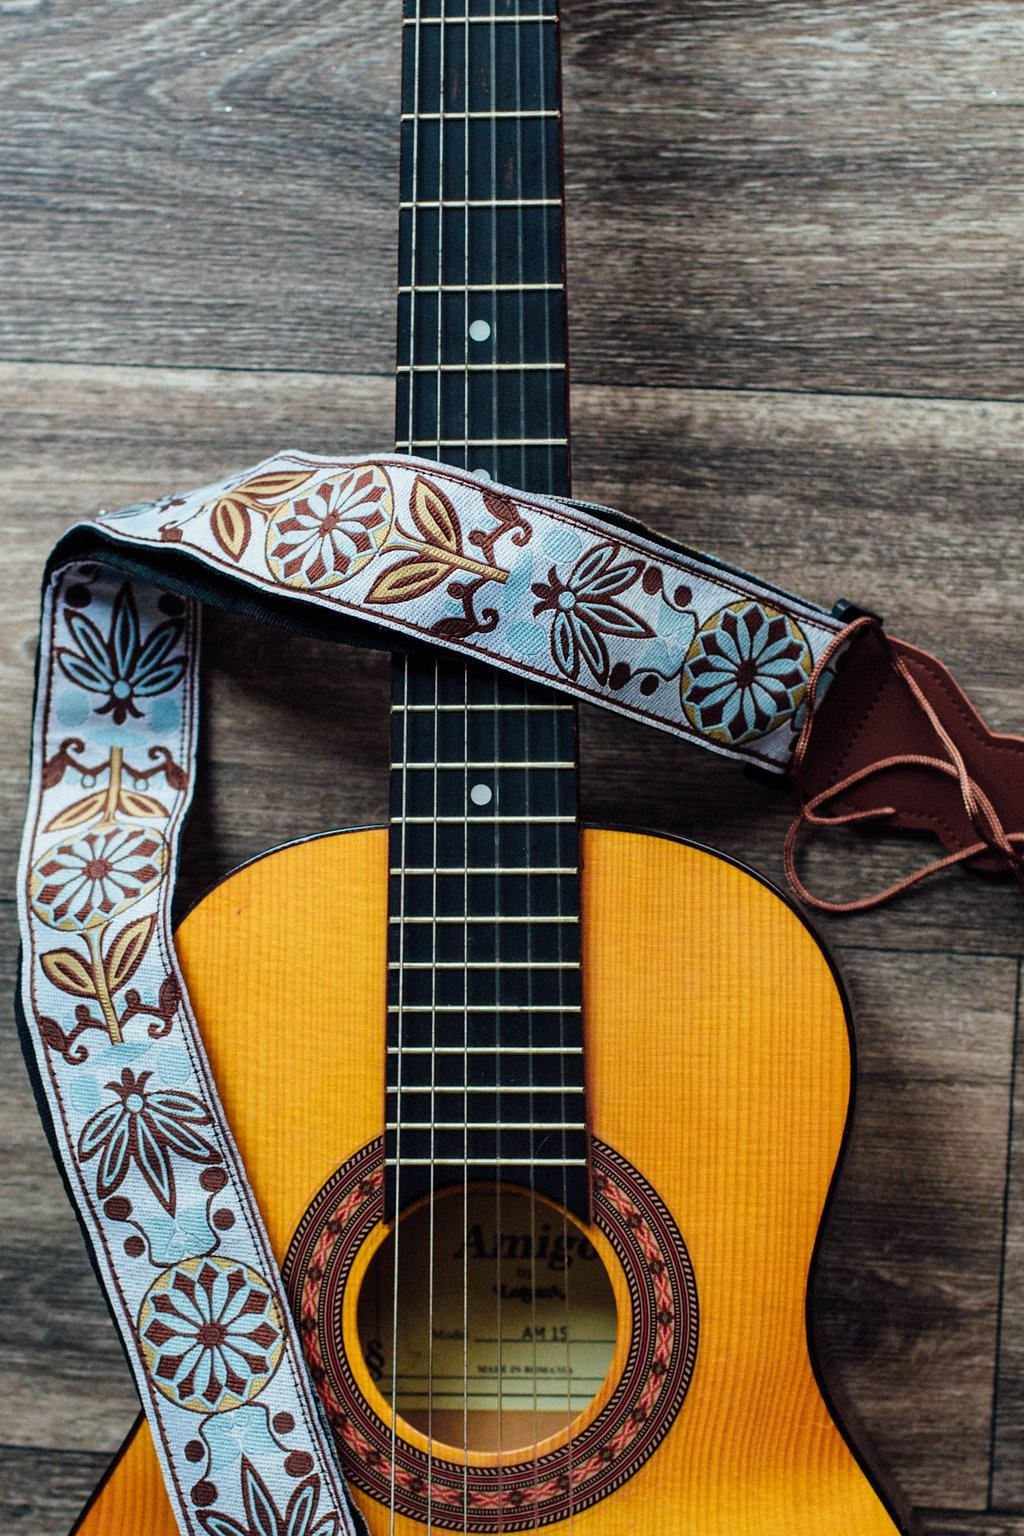 Vintage Guitar Strap Woven Guitar Strap For Acoustic Guitar Etsy In 2020 Guitar Strap Vintage Bass Guitar Gift Acoustic Guitar Strap